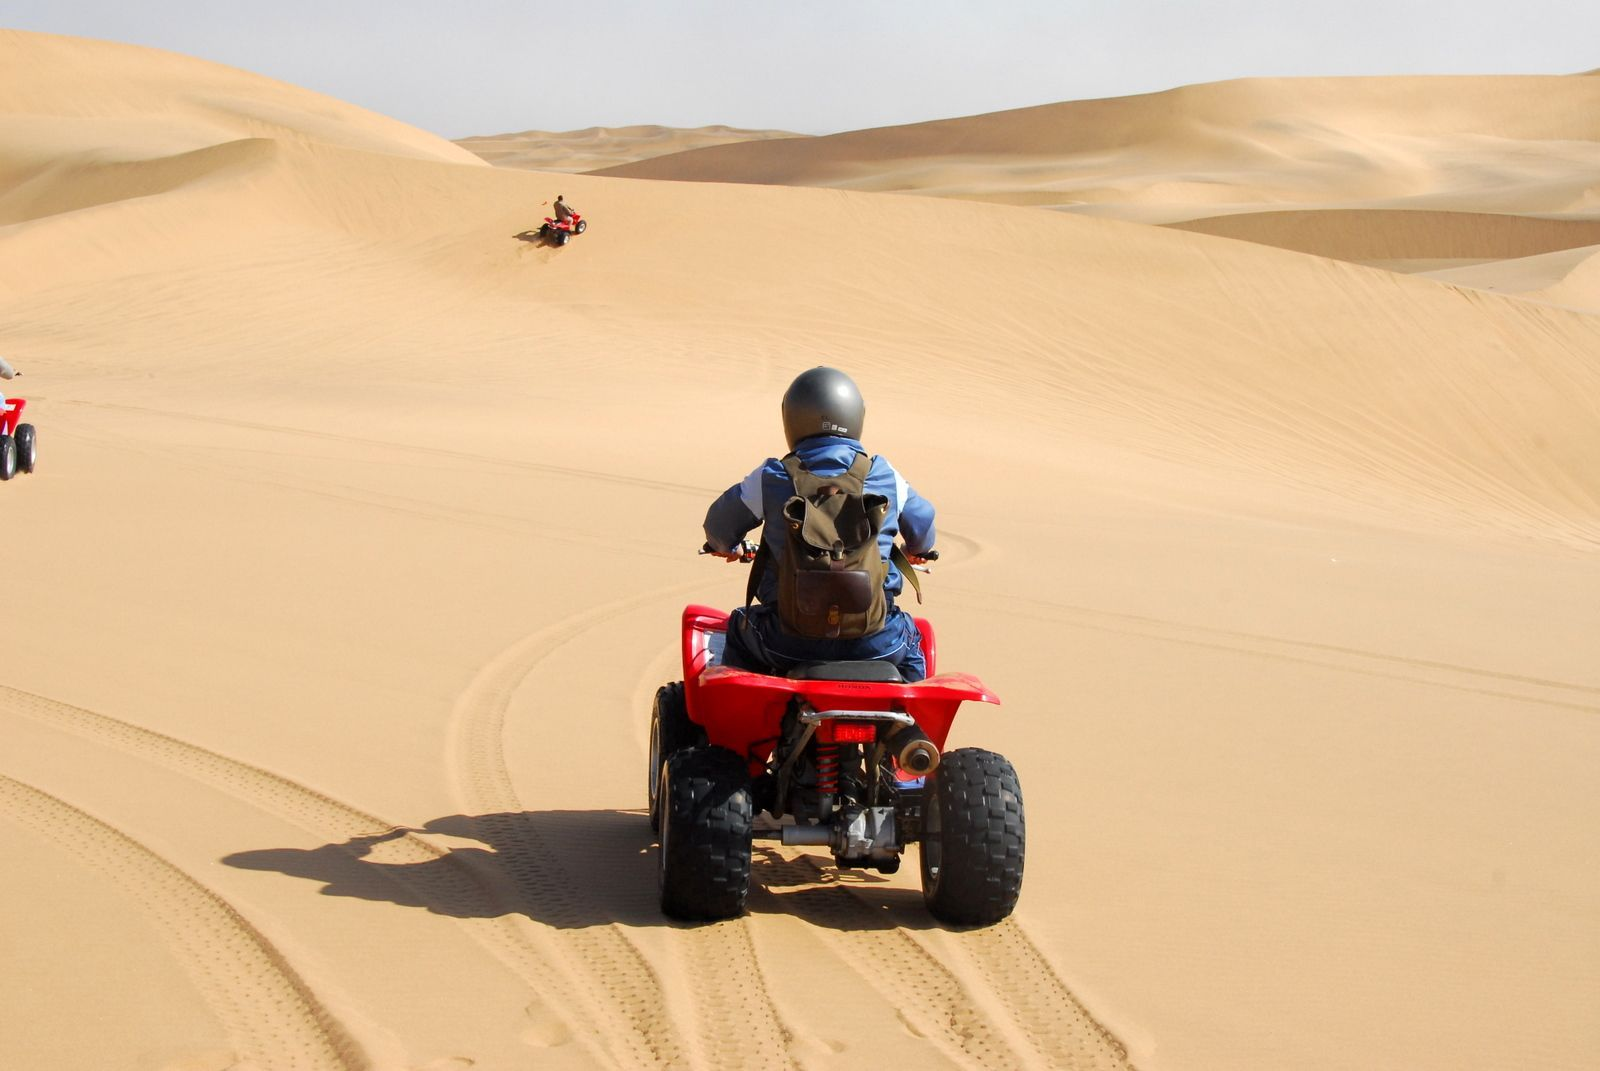 Dune Buggy Safari Dune buggy, Dream holiday, Adventure tours